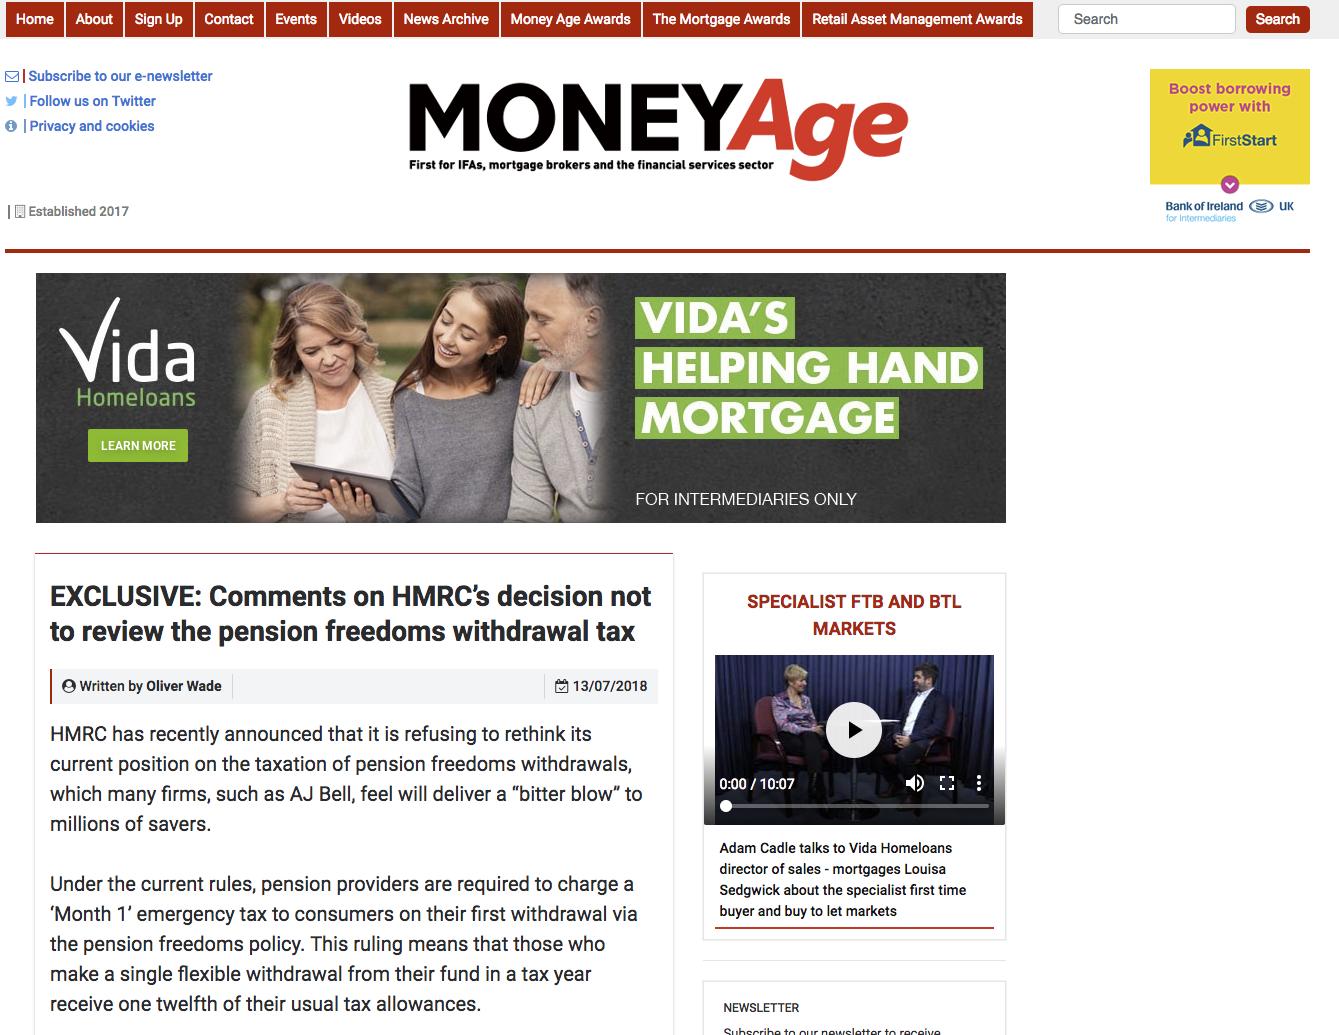 MoneyAge article HMRC